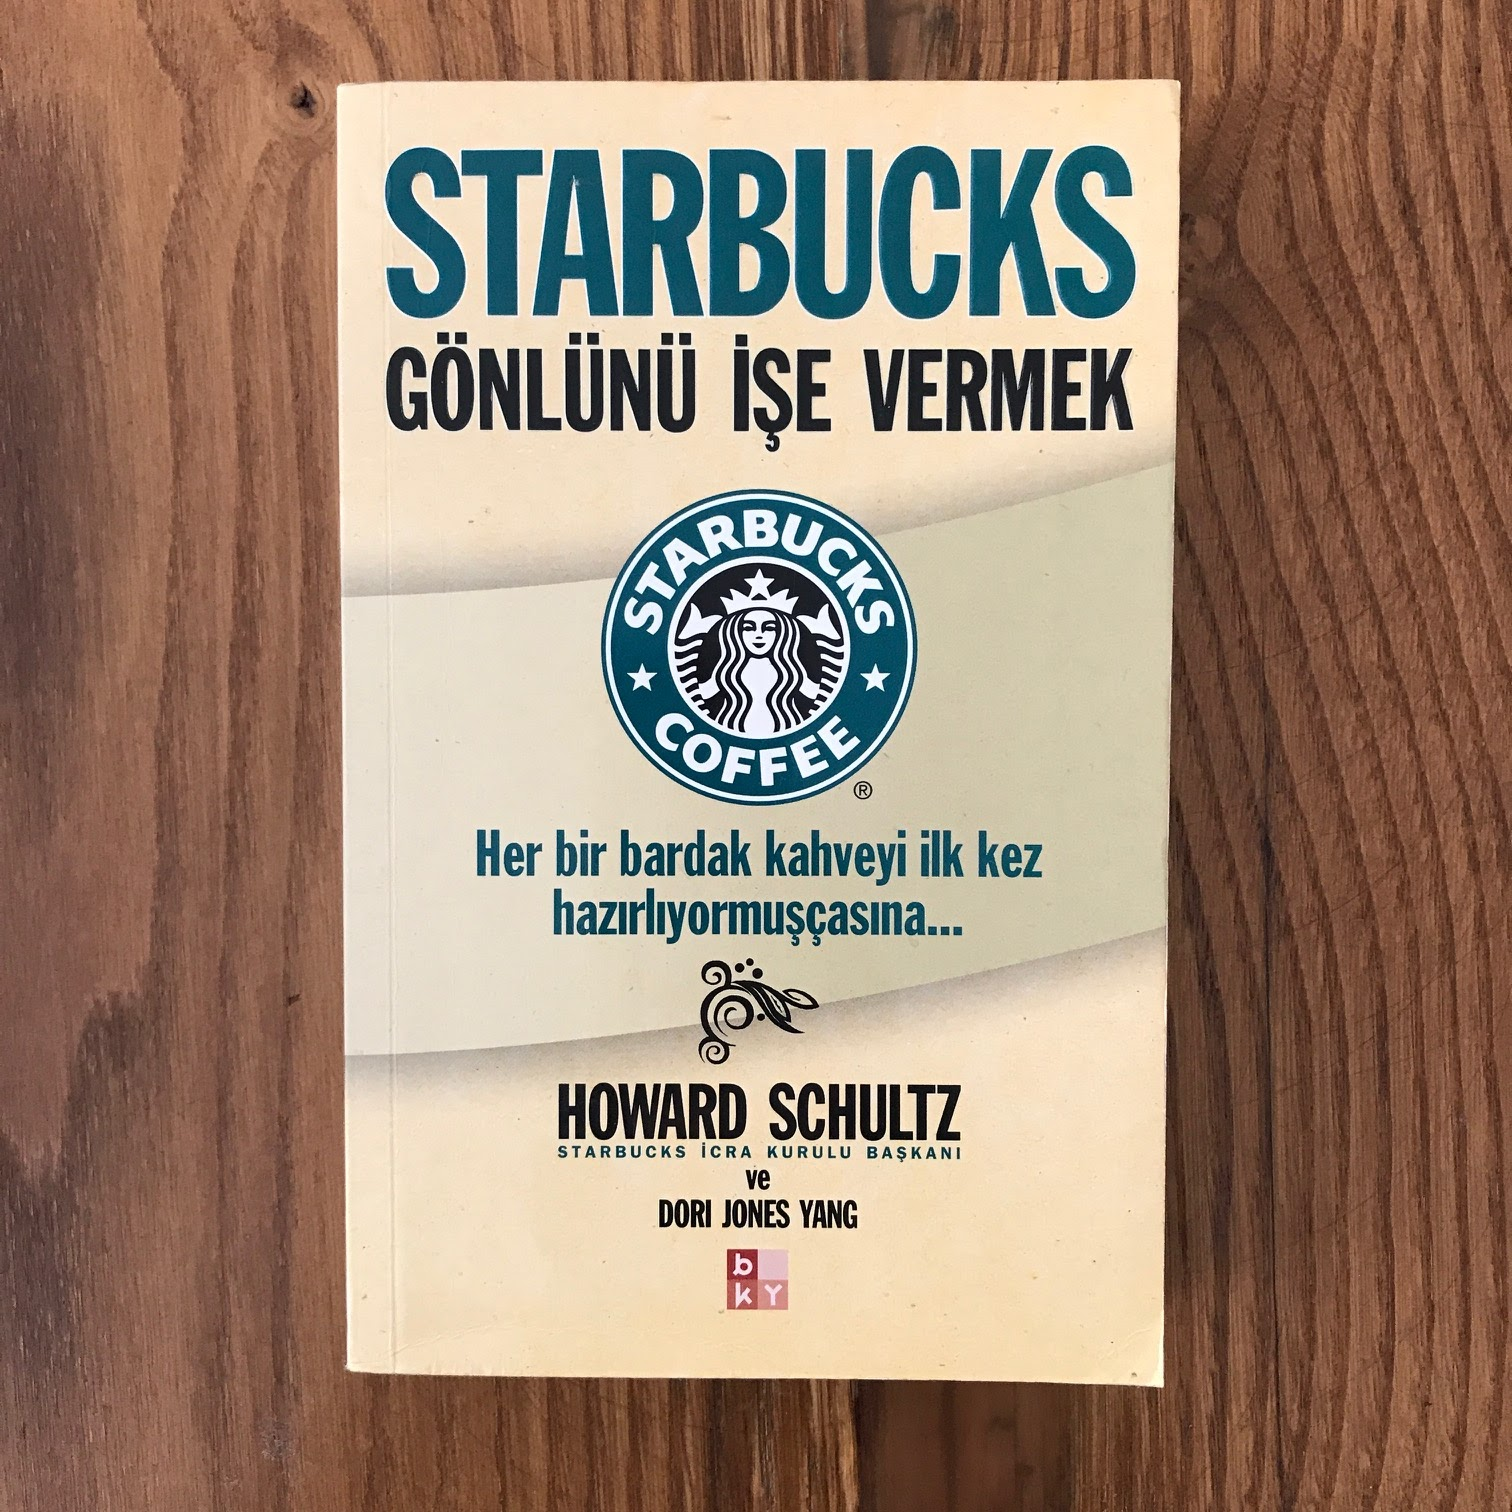 Starbucks Gonlunu Ise Vermek